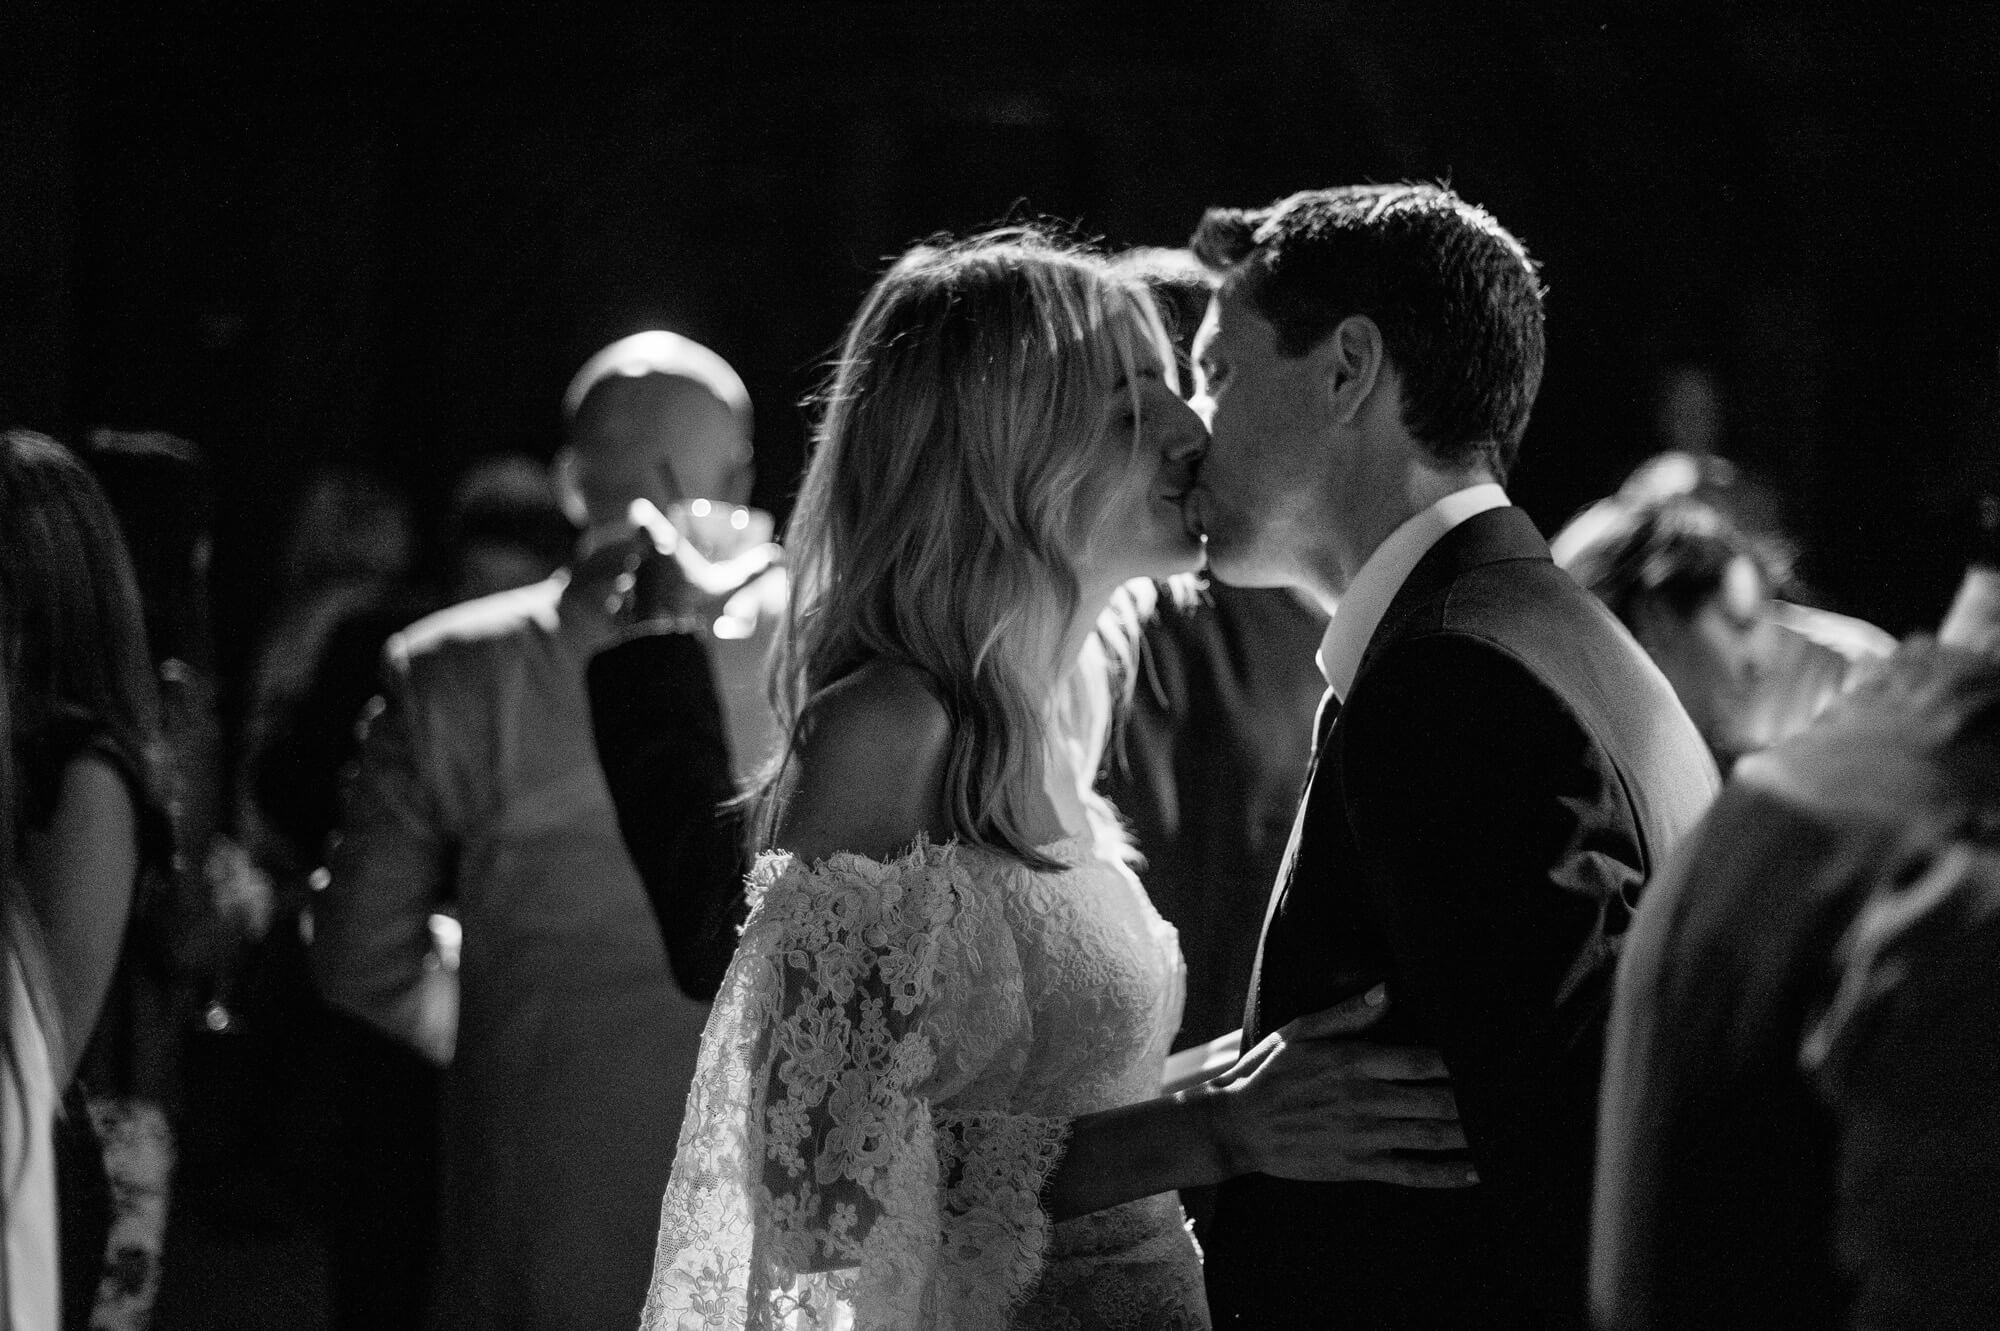 los-olivos-firestone-winery-destination-wedding-central-coast-wedding-photographer-33.jpg